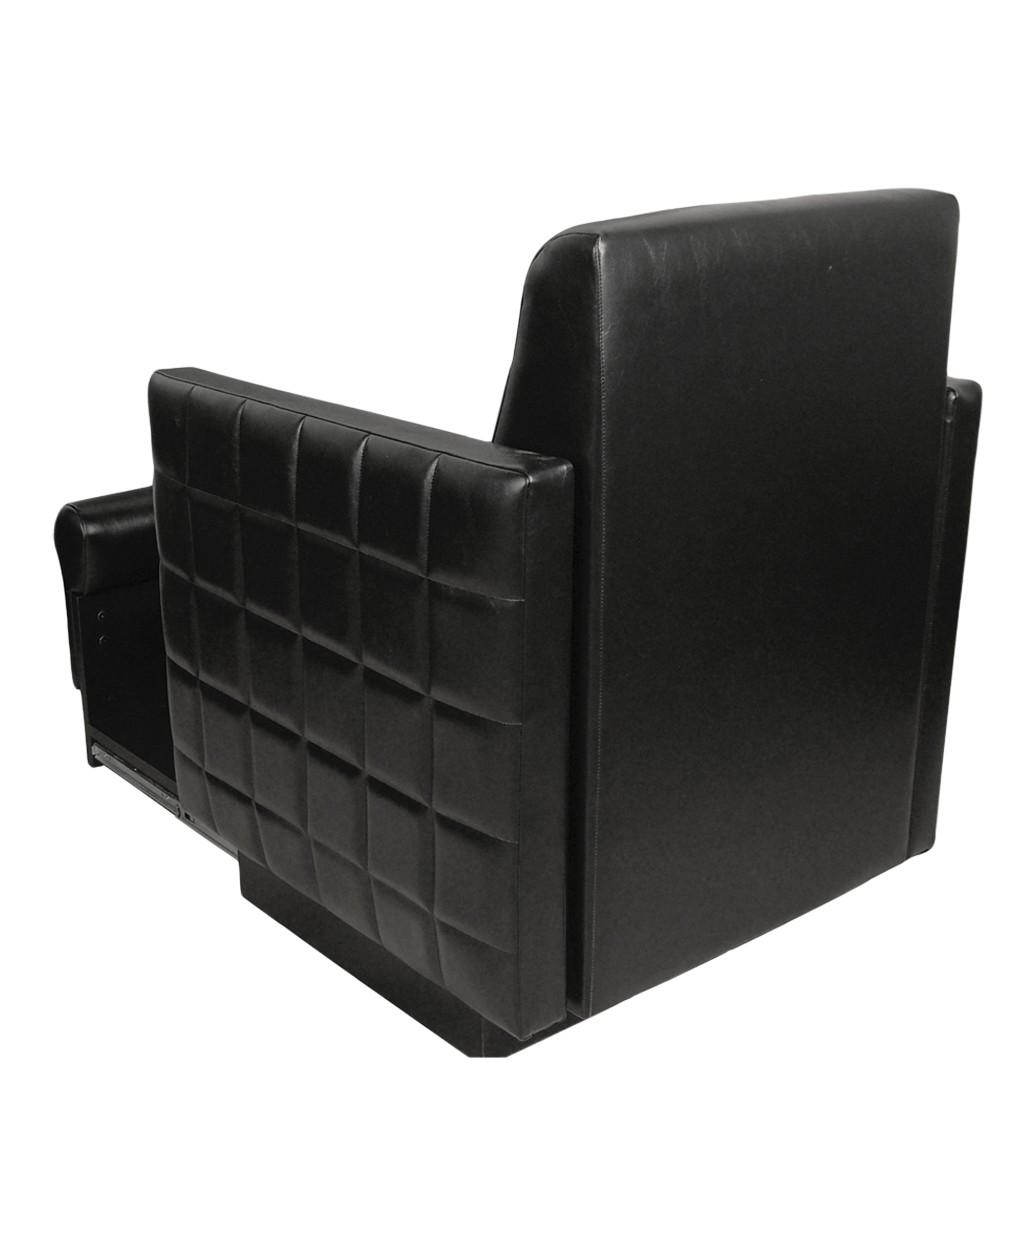 Collins 2560 Nouveau Club Pedicure Chair w/ Footsie Bath